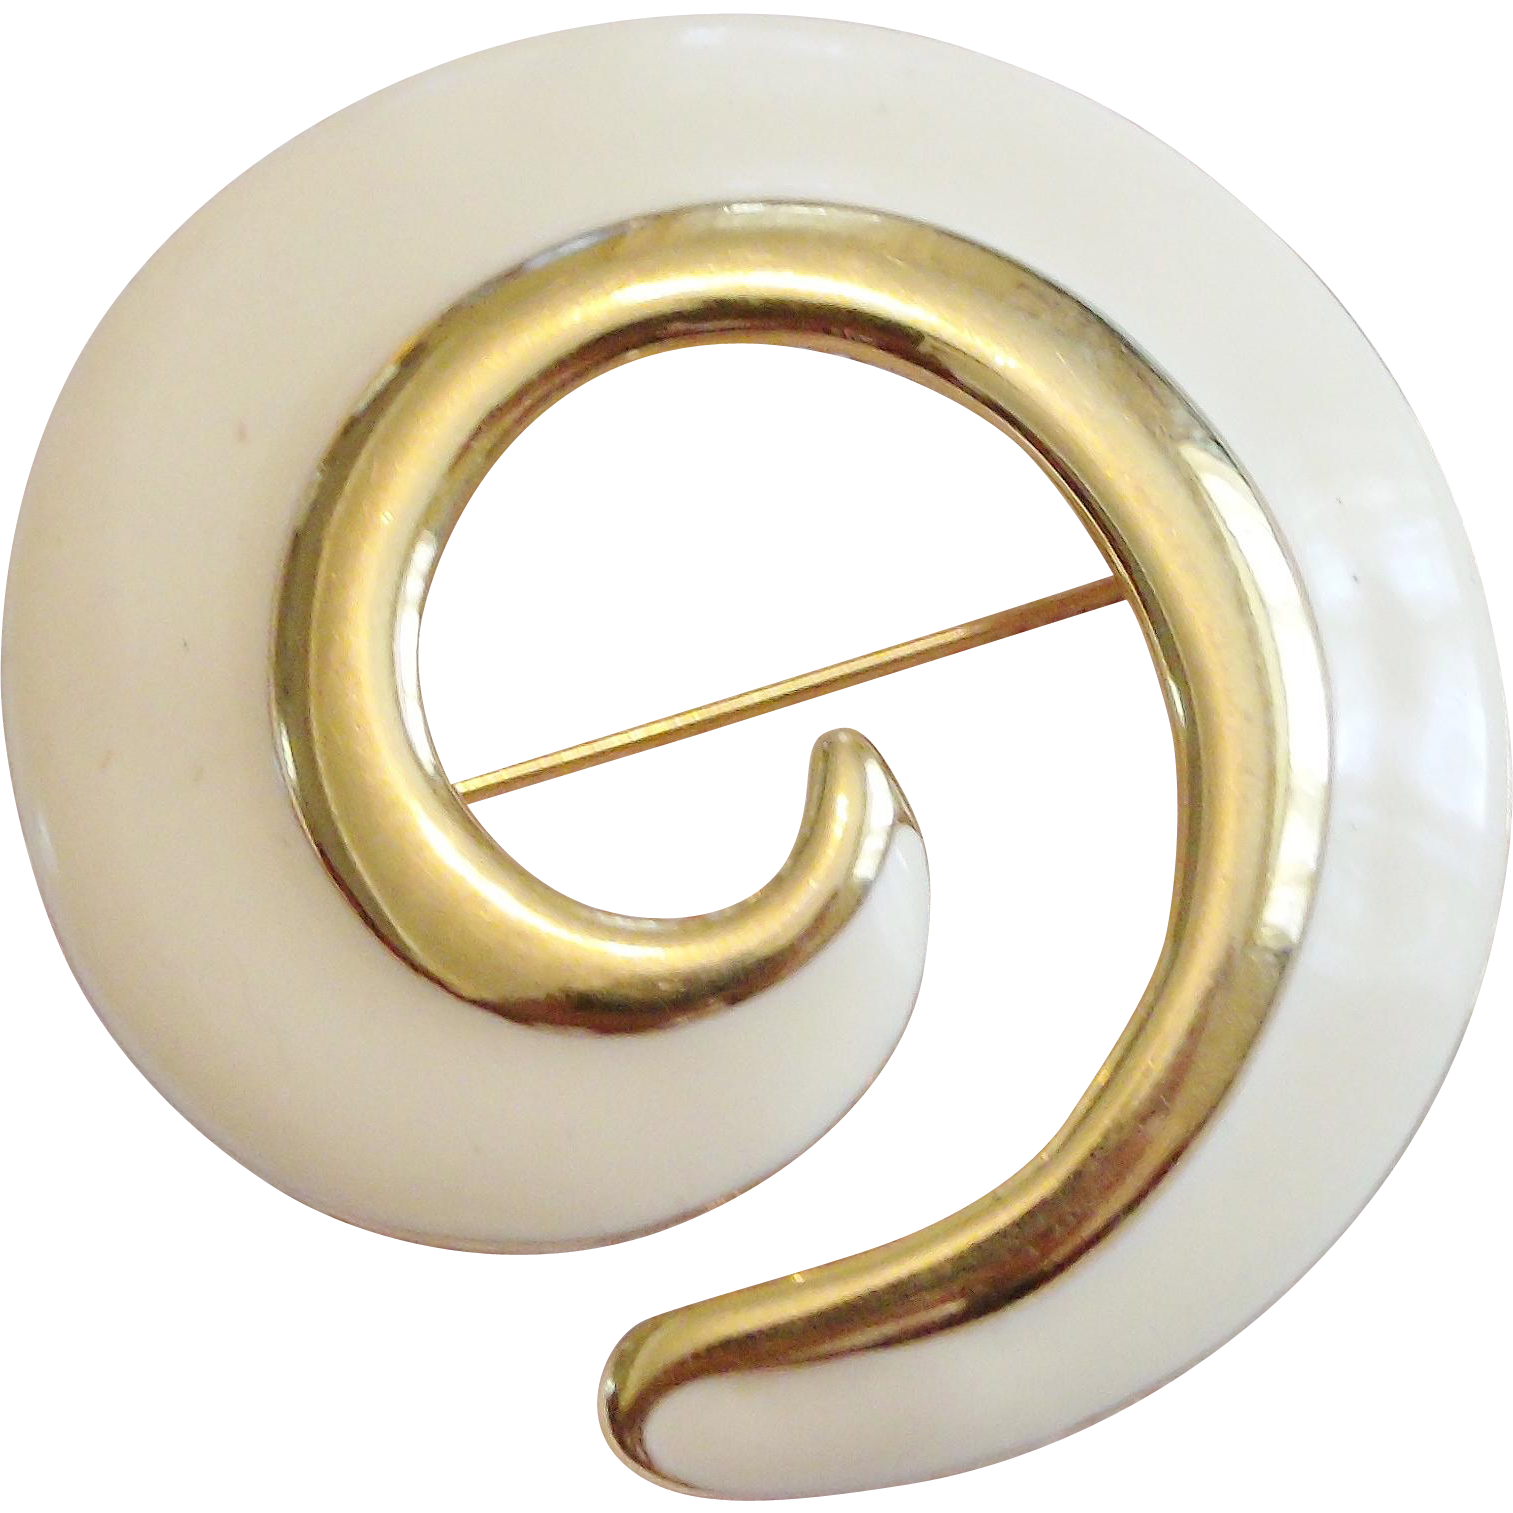 Vintage Monet Gold-Tone and Cream Enamel Swirl Brooch